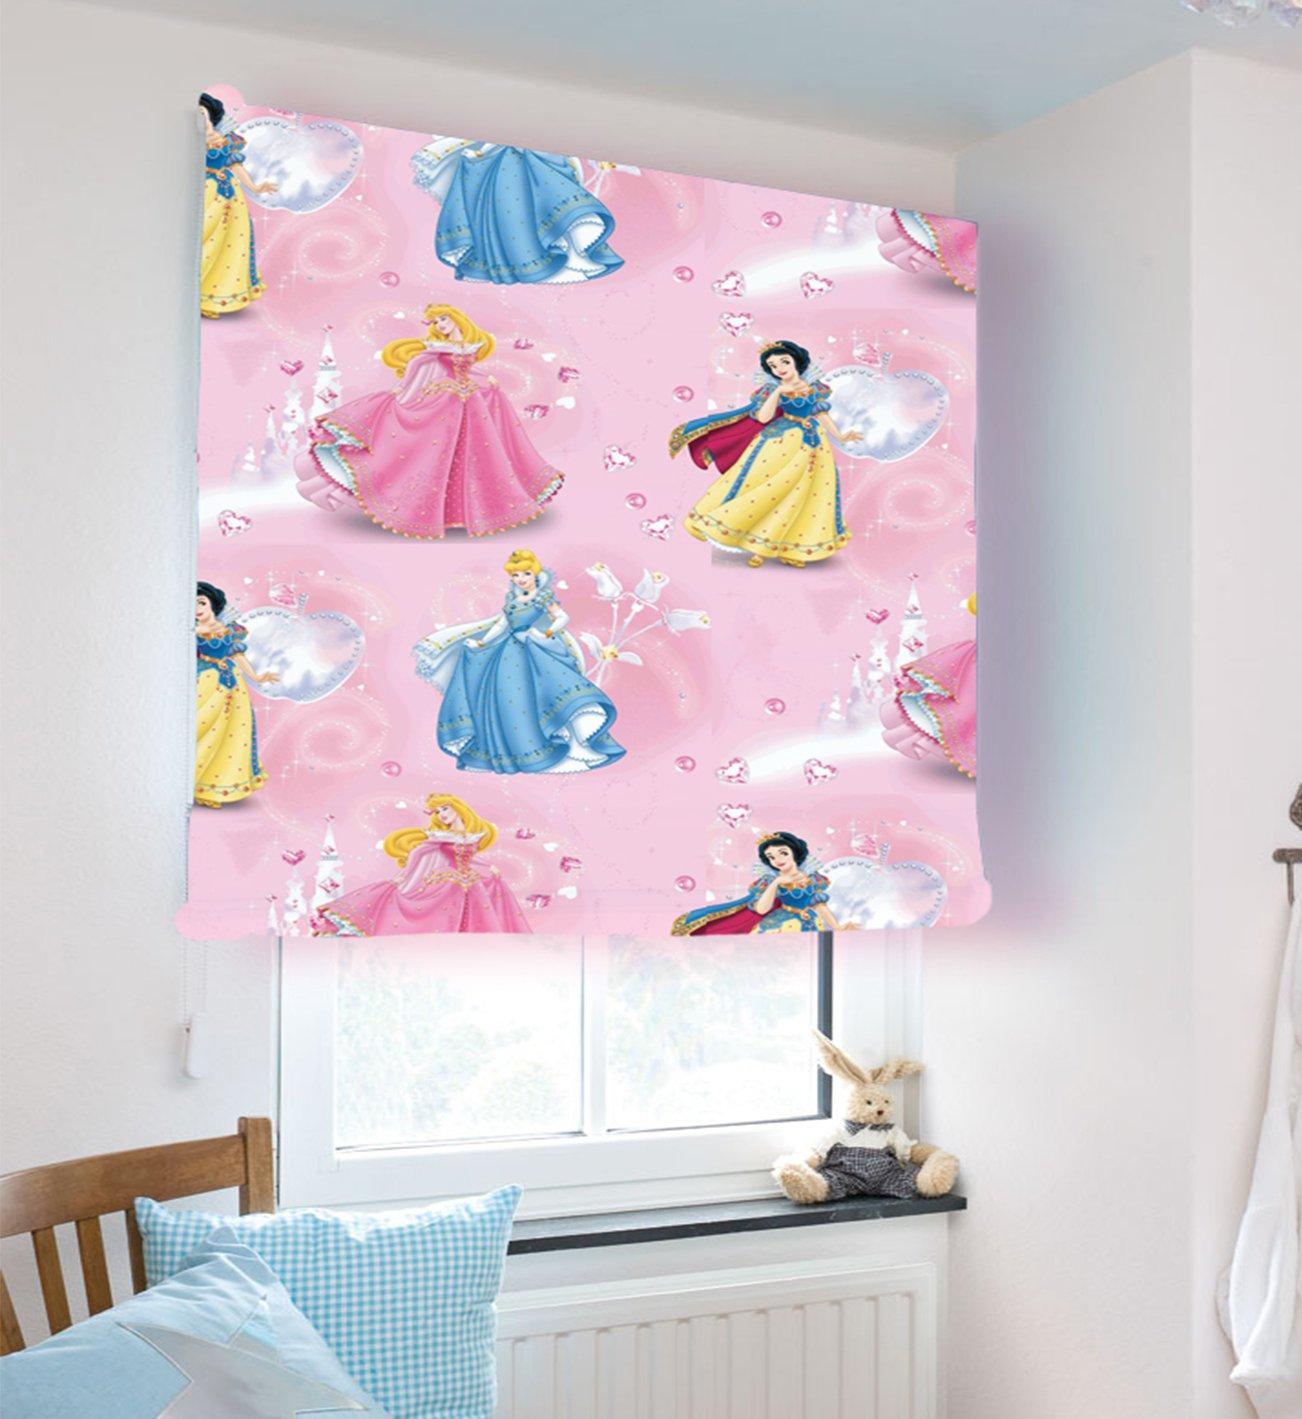 Amazon.de: Kinderzimmer/Spielzimmer, pink\'s princess-disney pixar ...